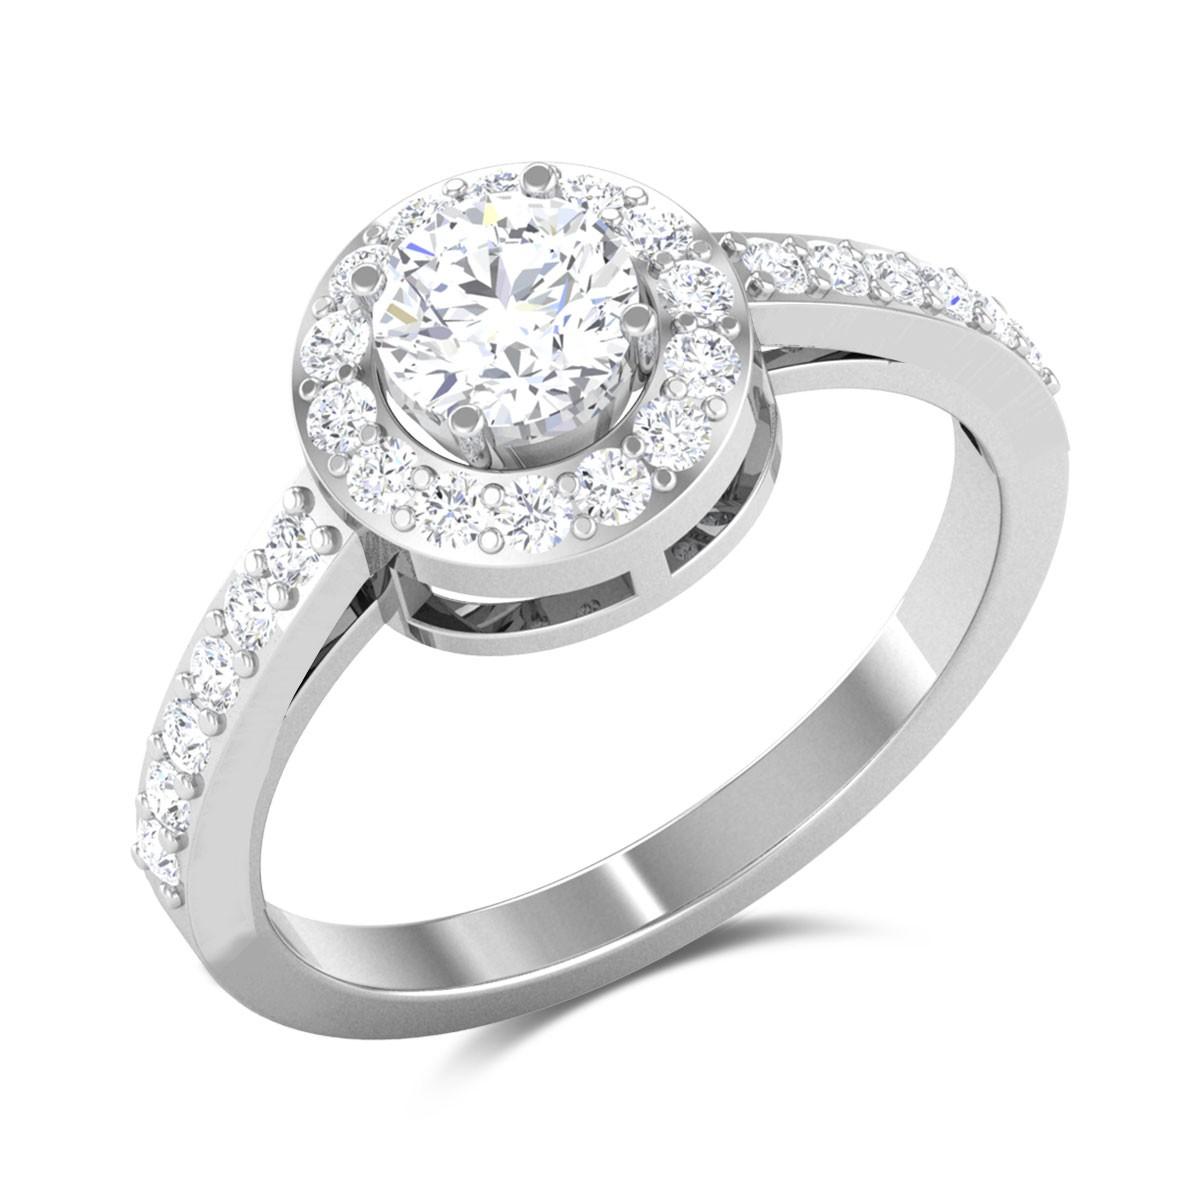 Plumerian Love Solitaire Ring